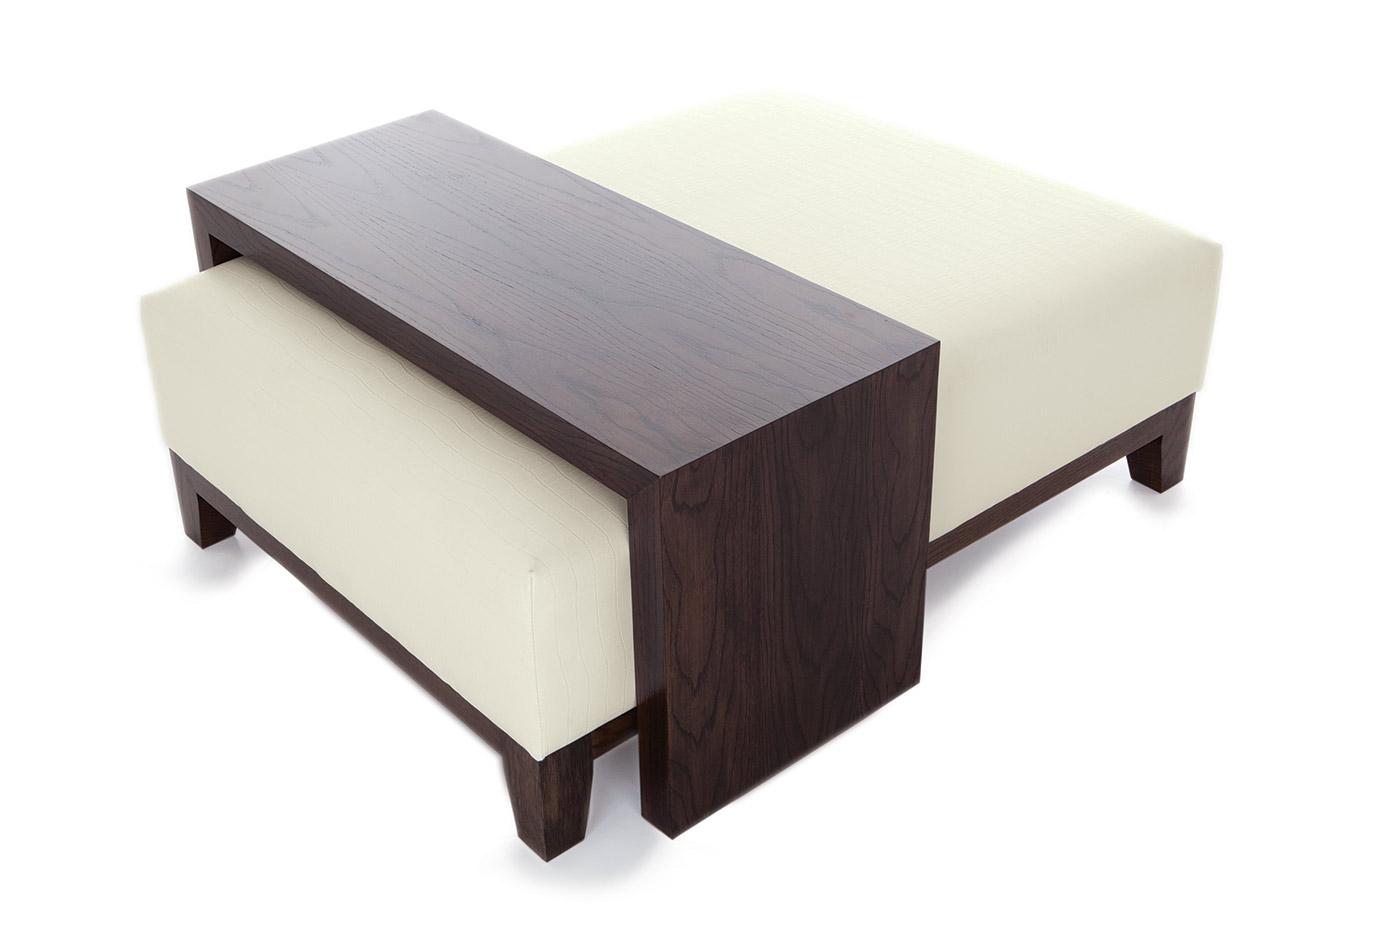 harris coffee table stool charlotte james furniture. Black Bedroom Furniture Sets. Home Design Ideas